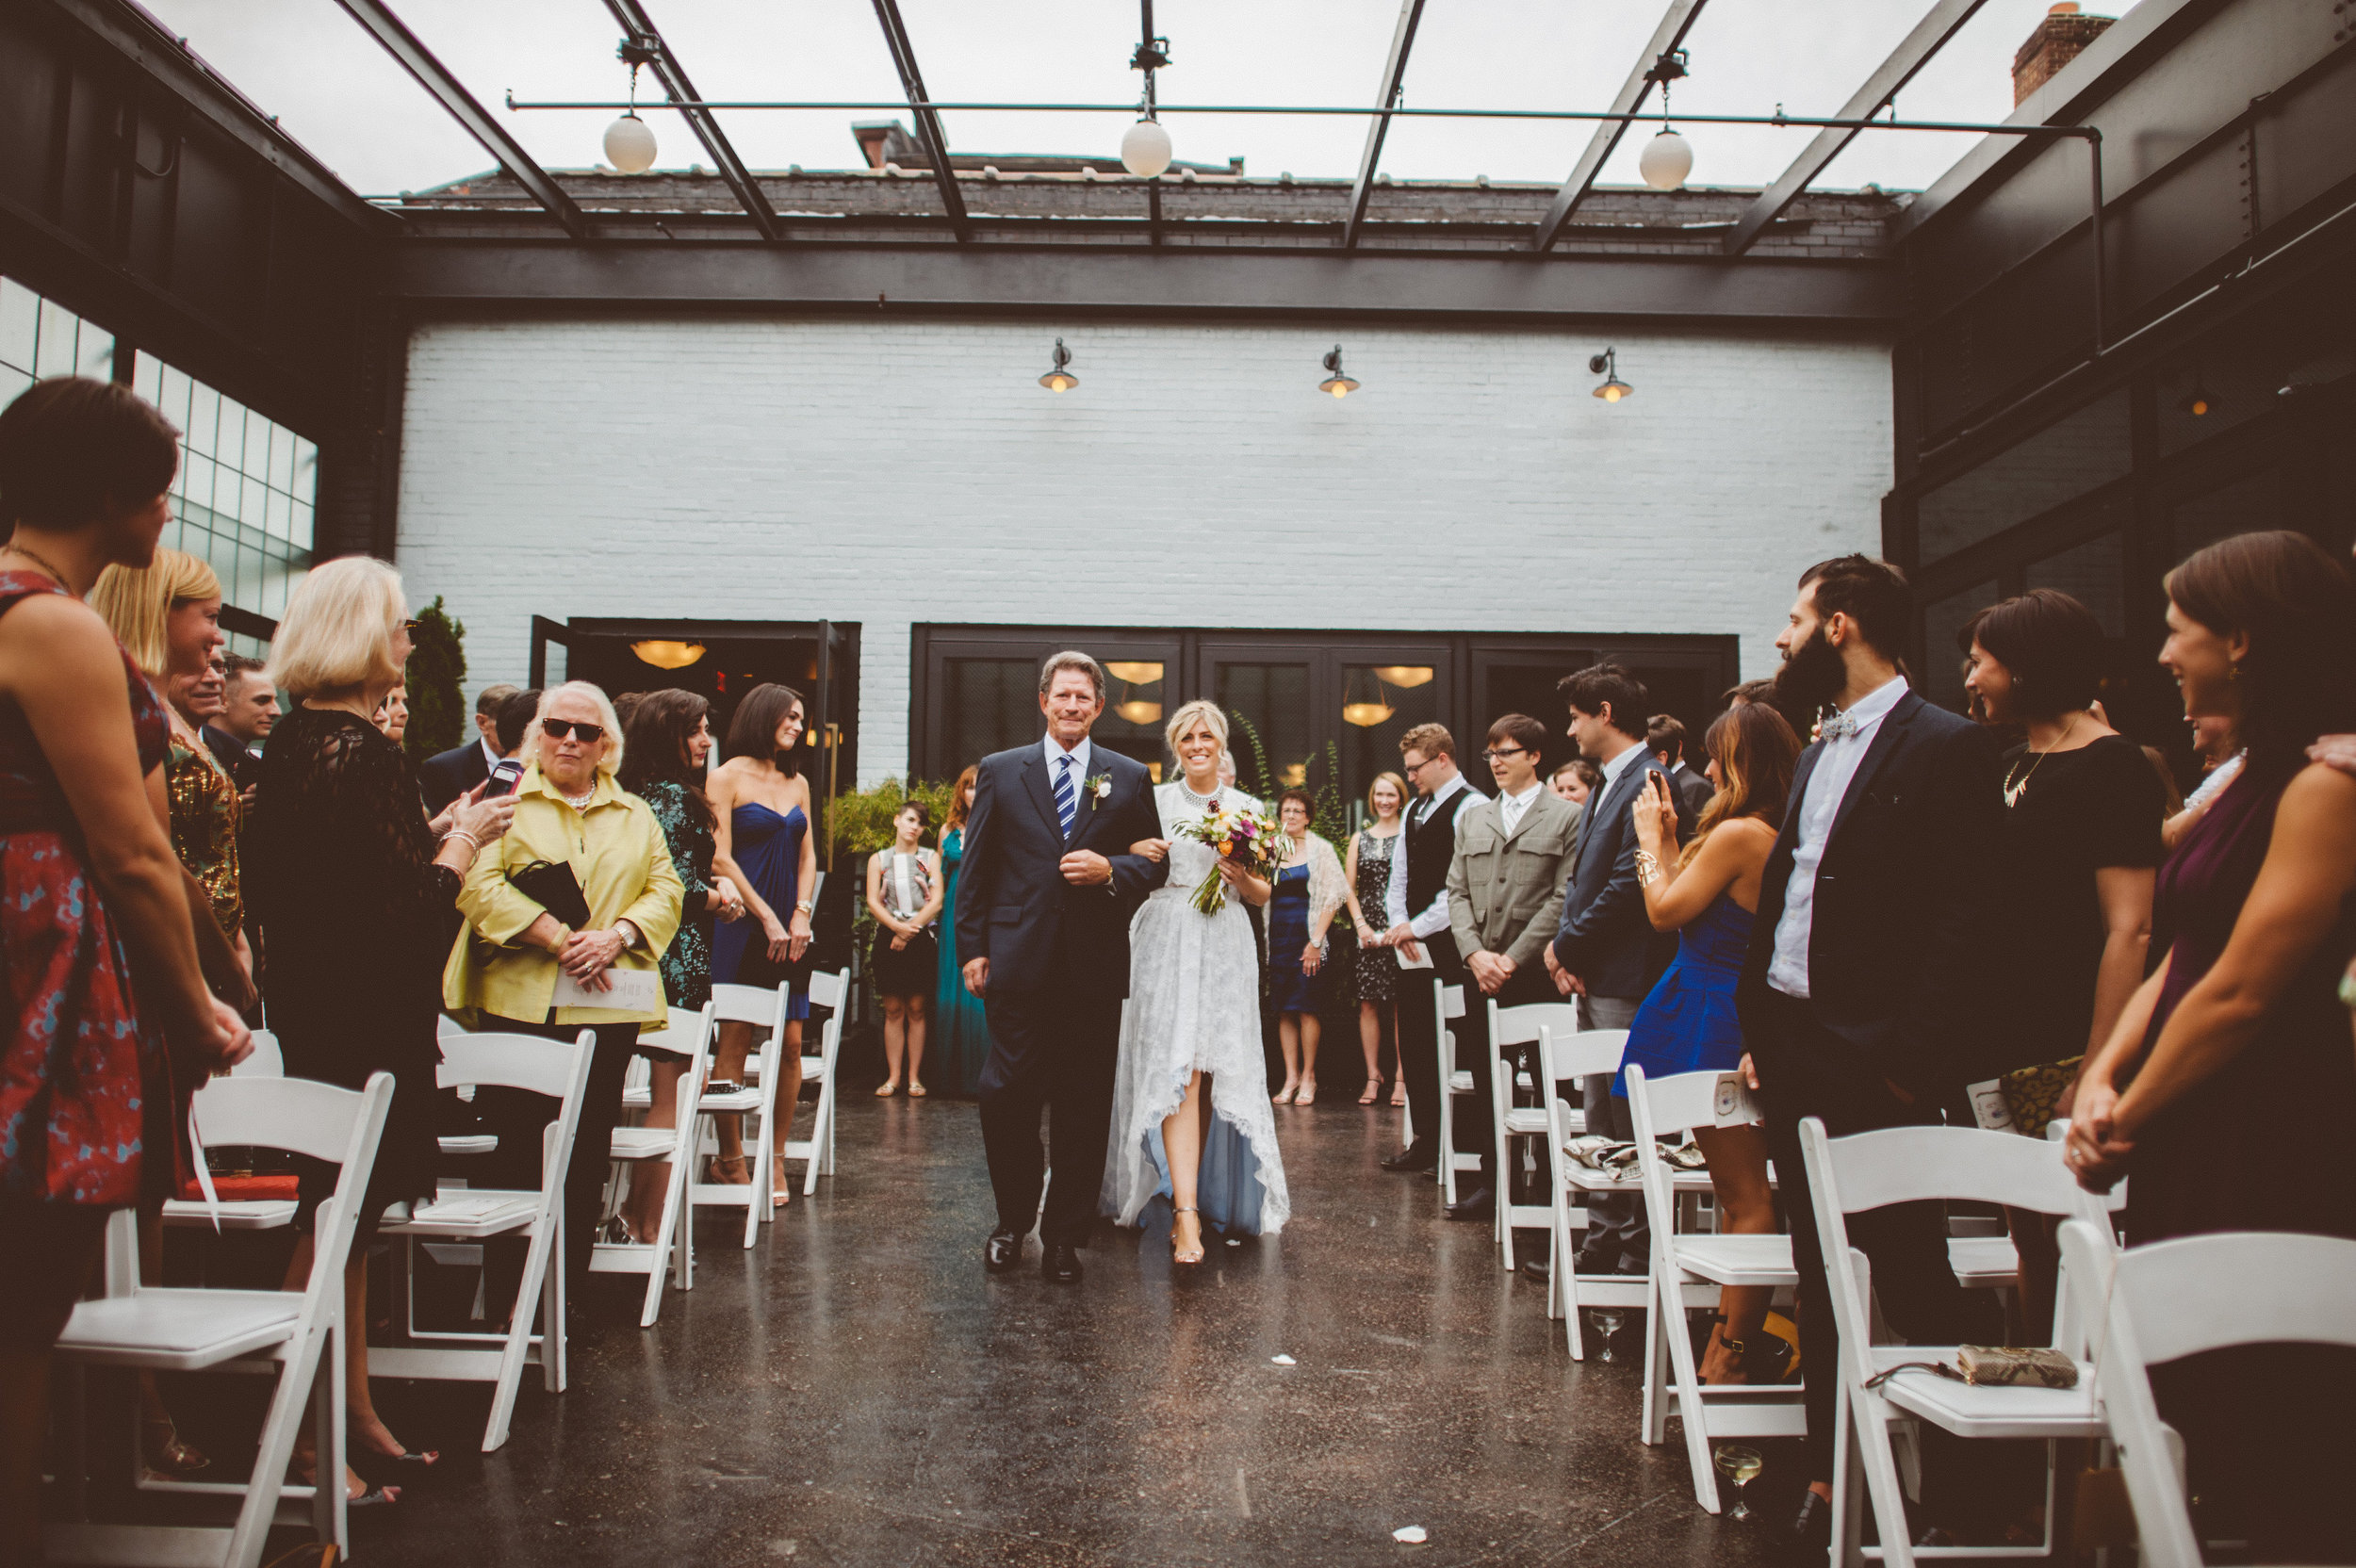 deenie hartzog-mislock wedding day